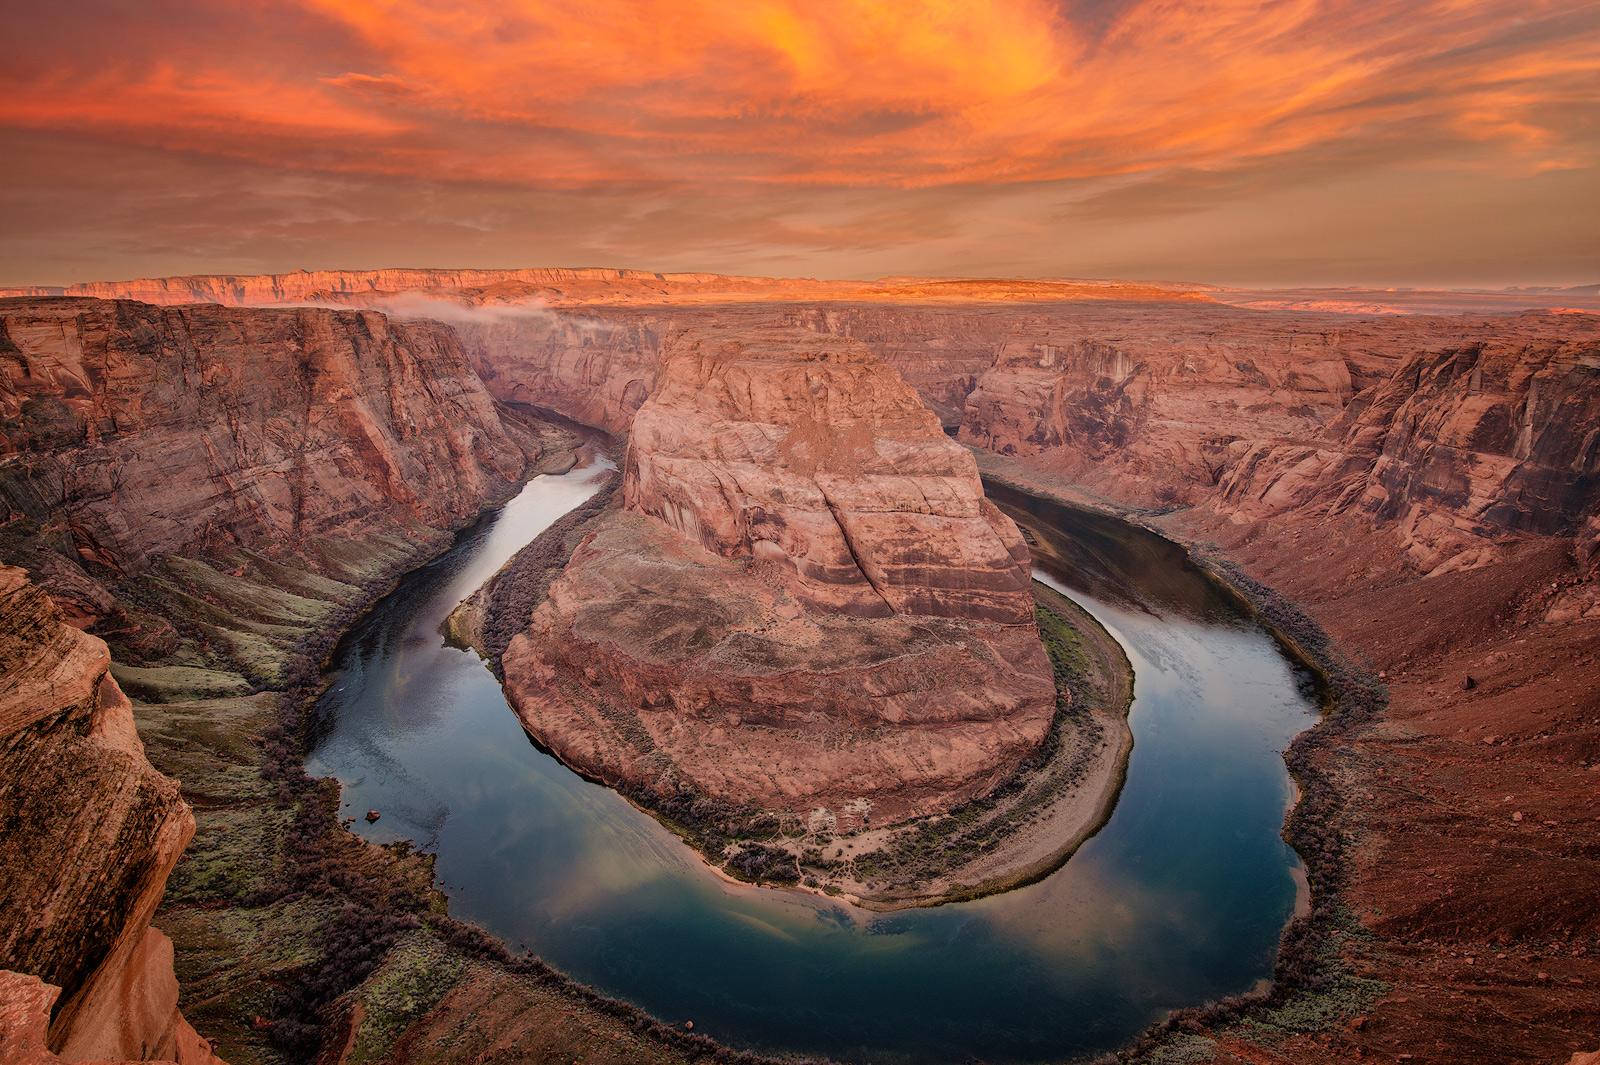 American, Southwest, Utah, Arizona, Nevada, desert, canyons, antelope, lake powell, page, grand canyons, arches, monument valley...